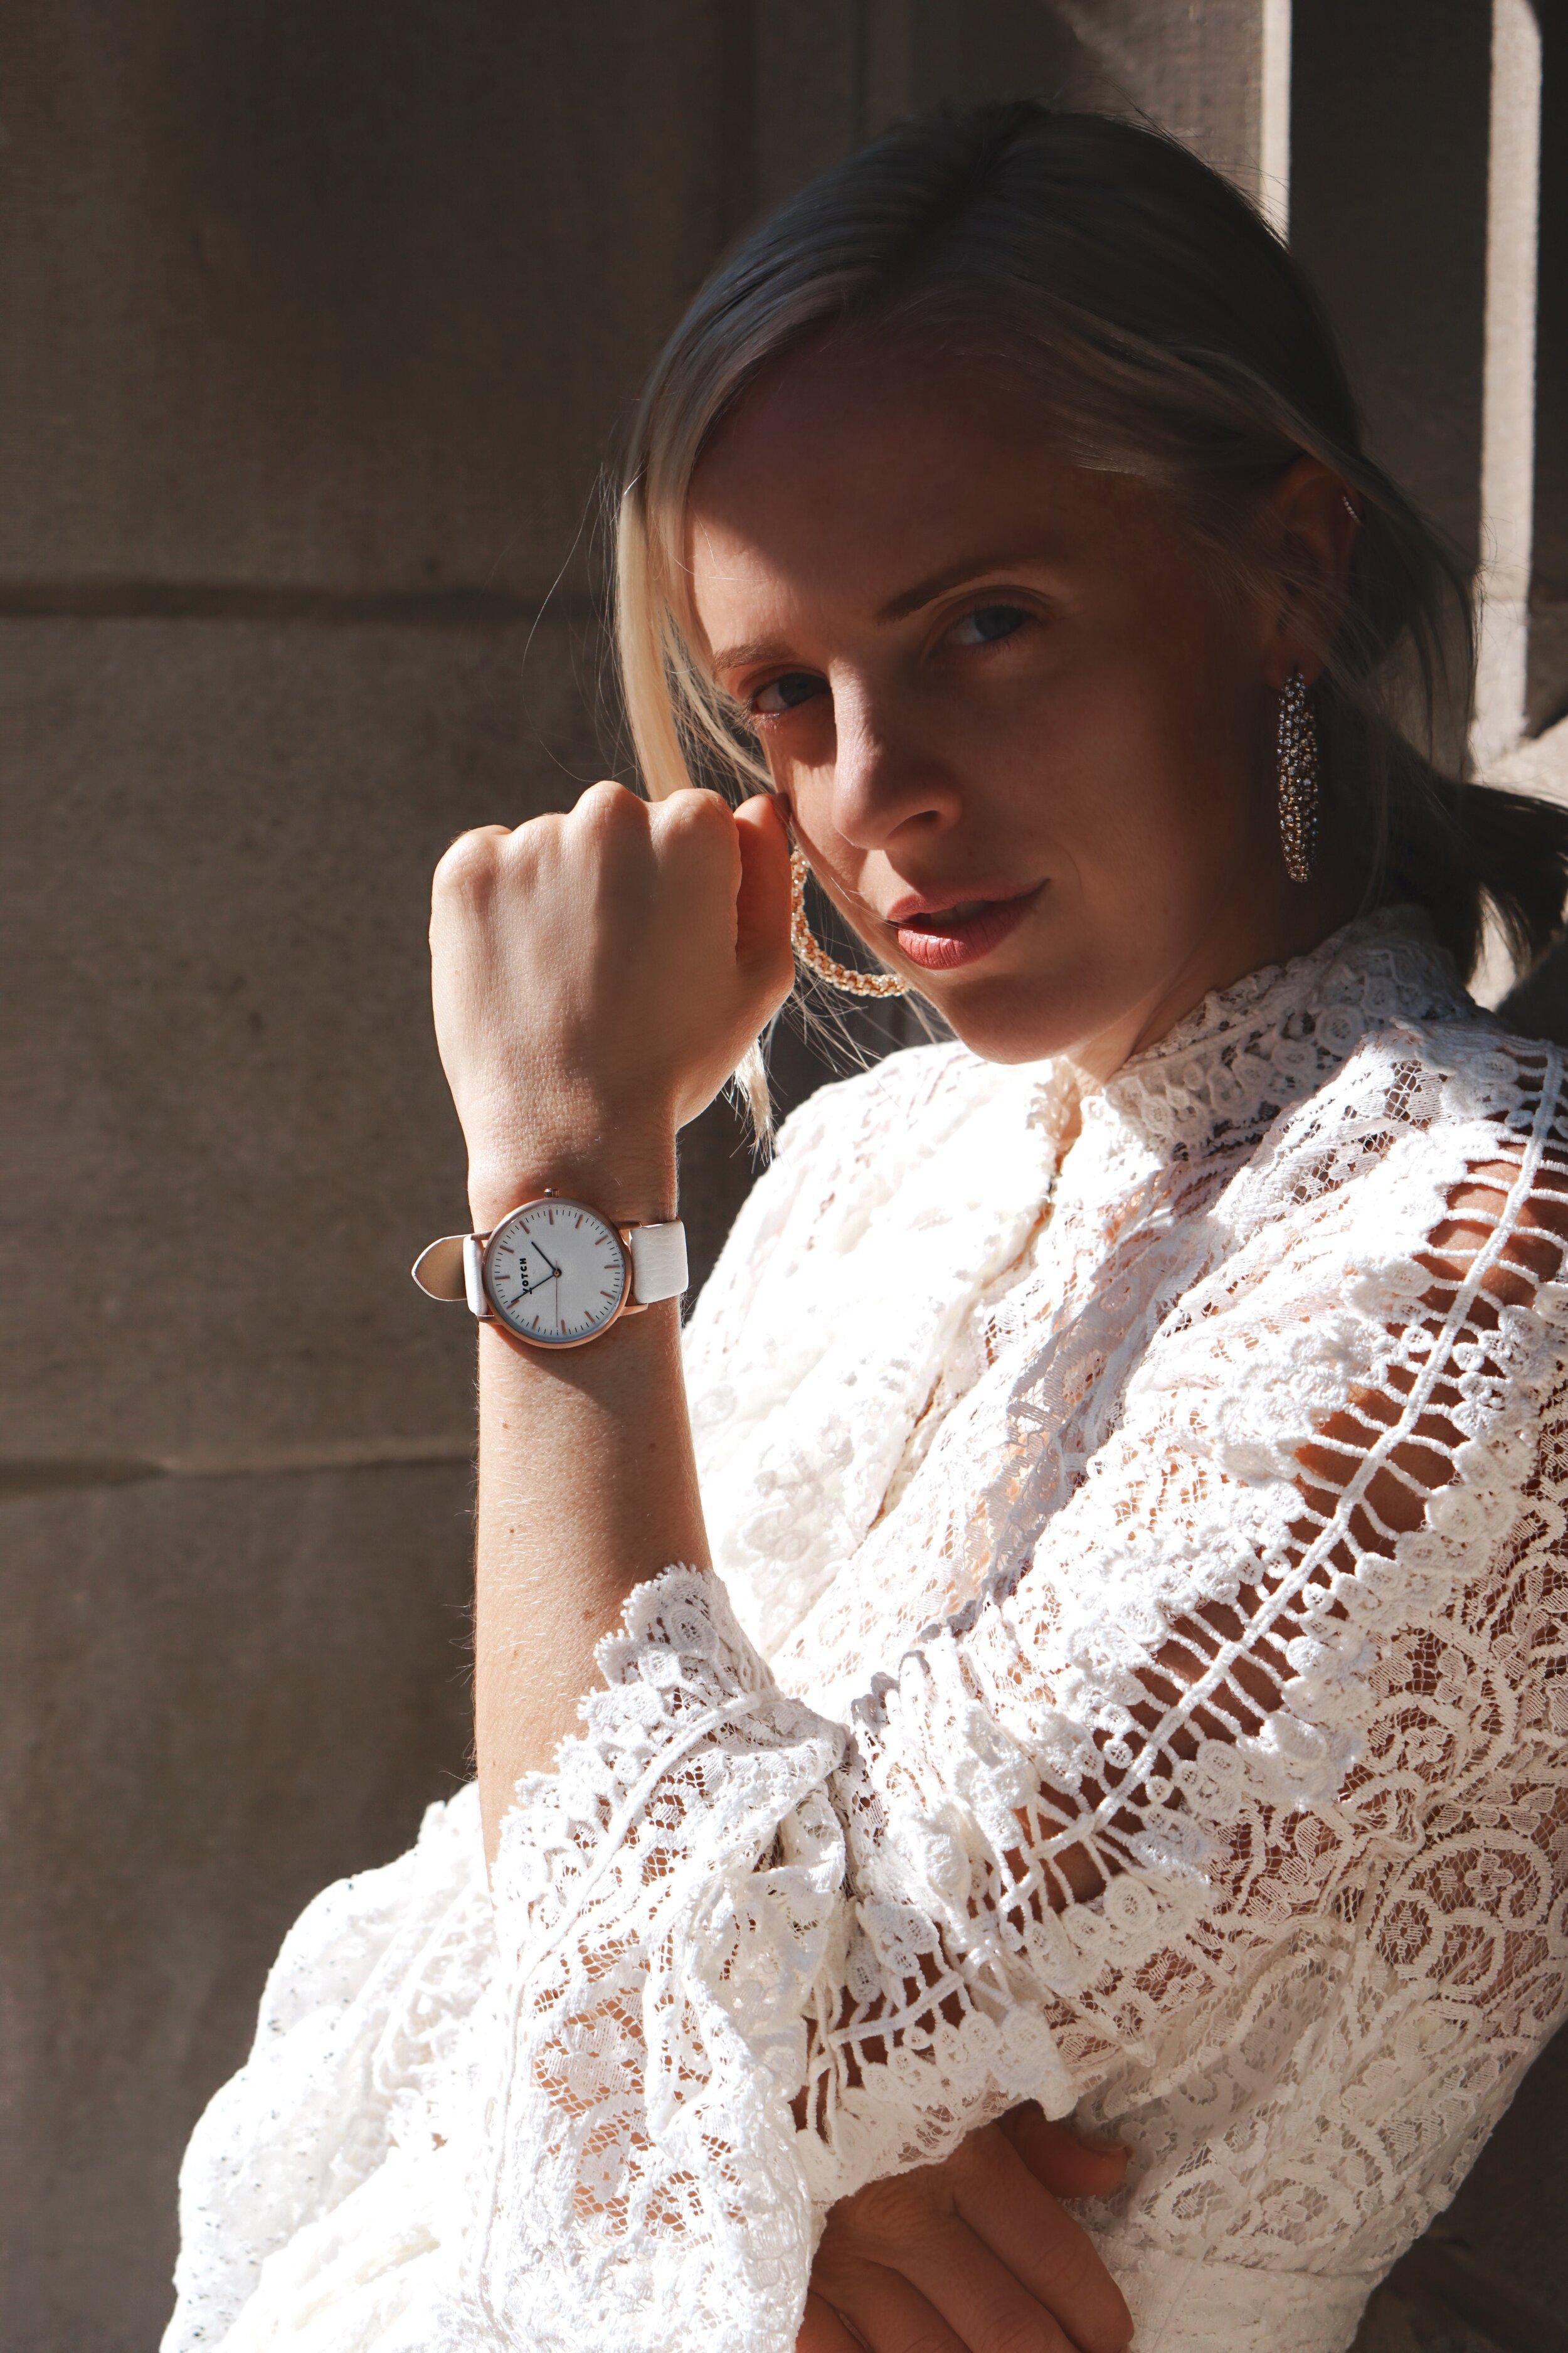 Vegan Watches, cruelty-free fashion, Sararose Krenger, white lace dress